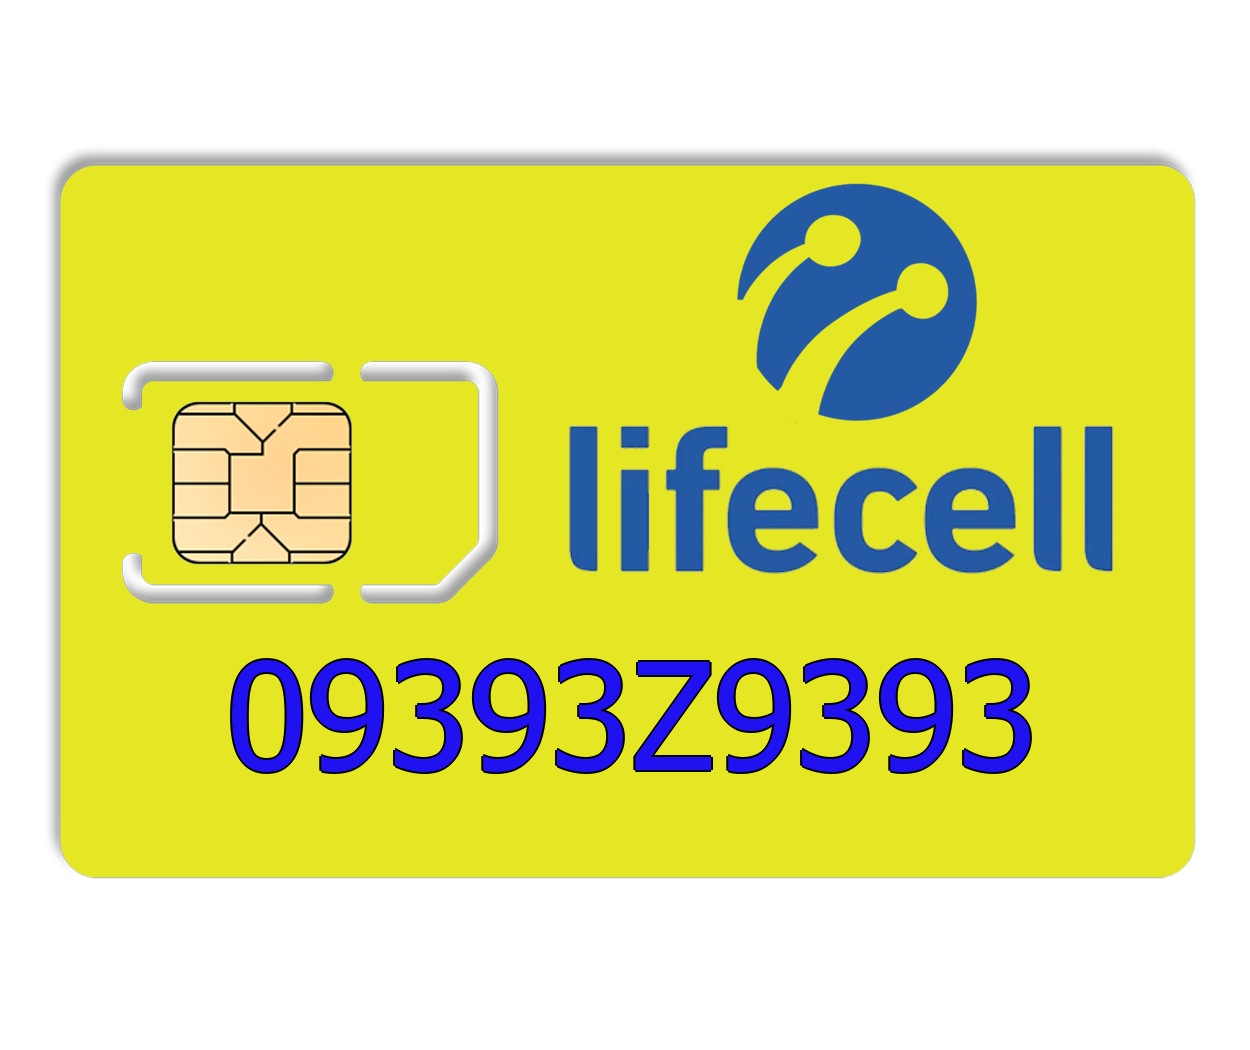 Красивый номер lifecell 09393Z9393